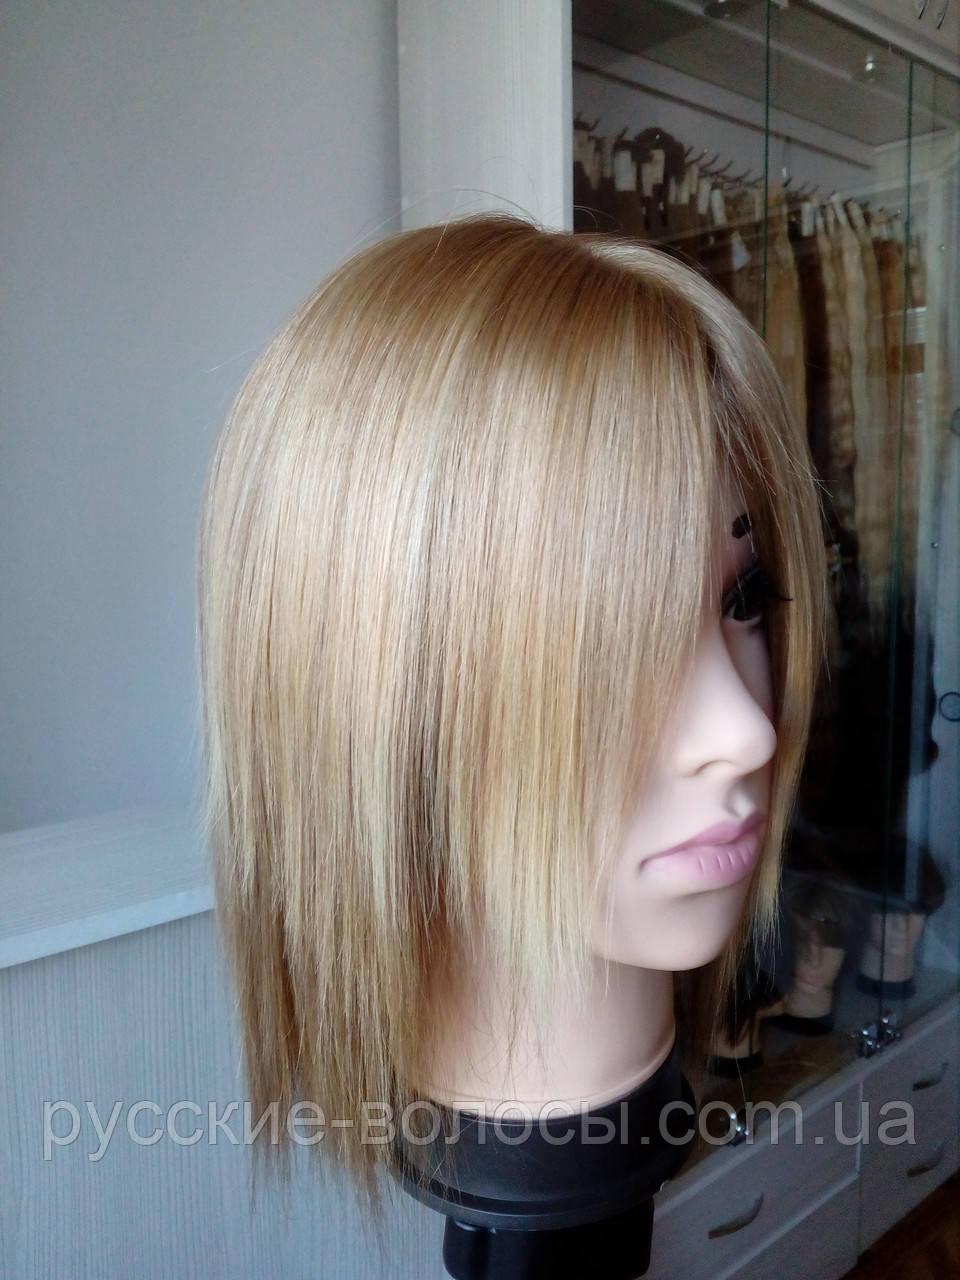 Жіночий парик натуральний блондин.